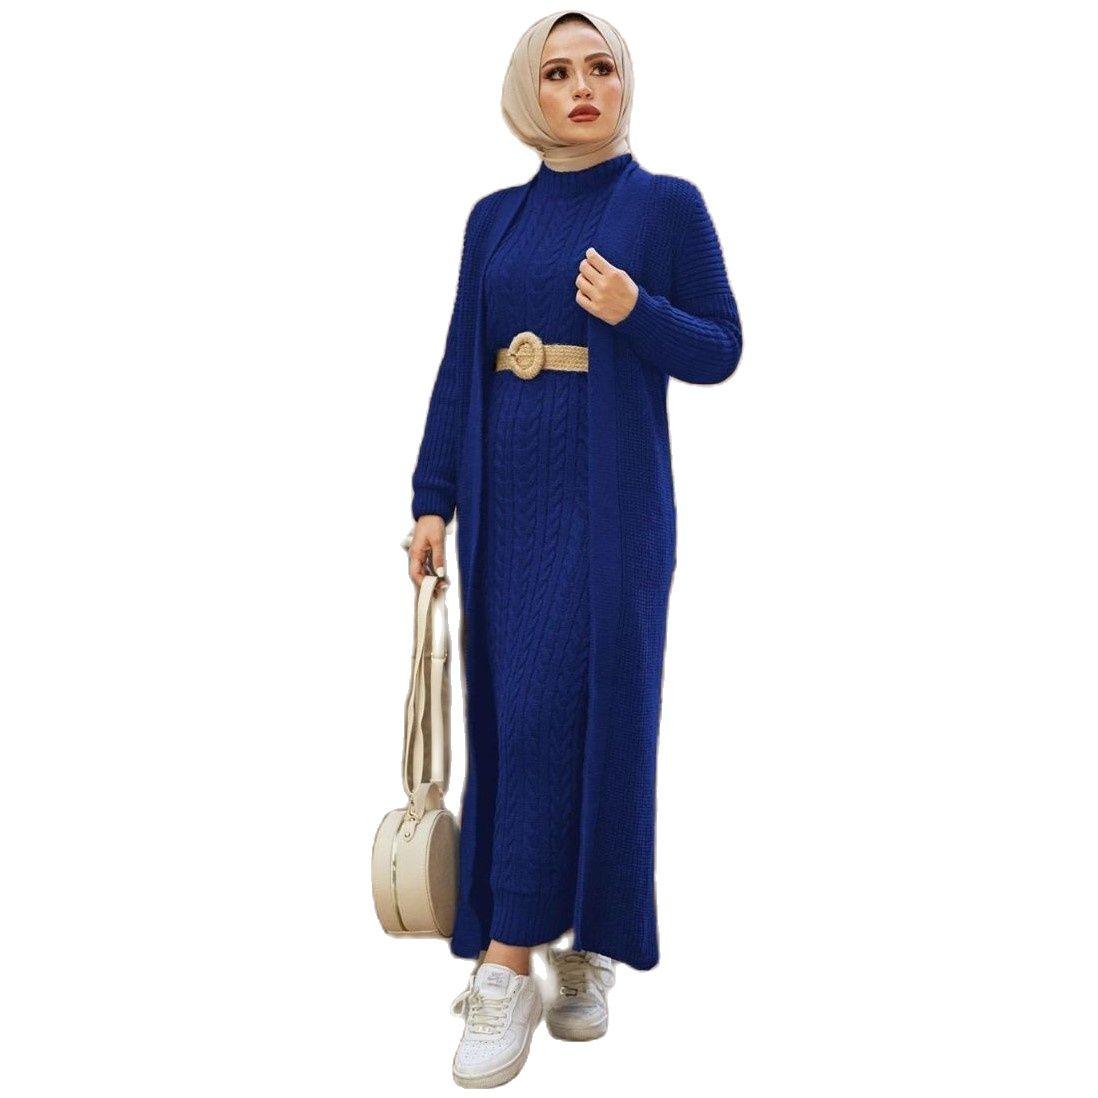 2 Pieces Woman Knitted Suit, Long Cardigan and Maxi dress Muslim Islamic Fashion Islamic Clothing Turkey Hijab Abaya Dubai 2021